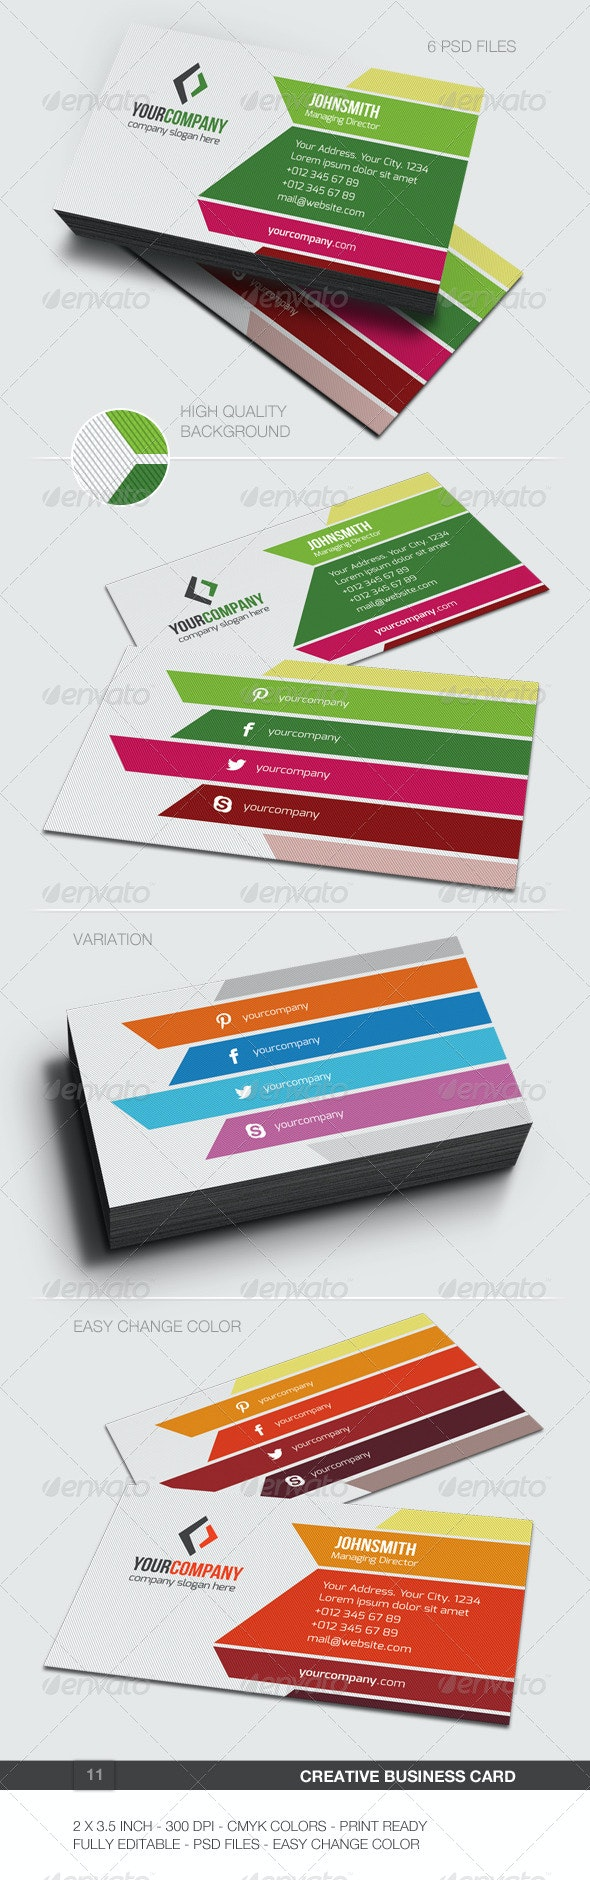 Creative Business Card - 11 - Creative Business Cards